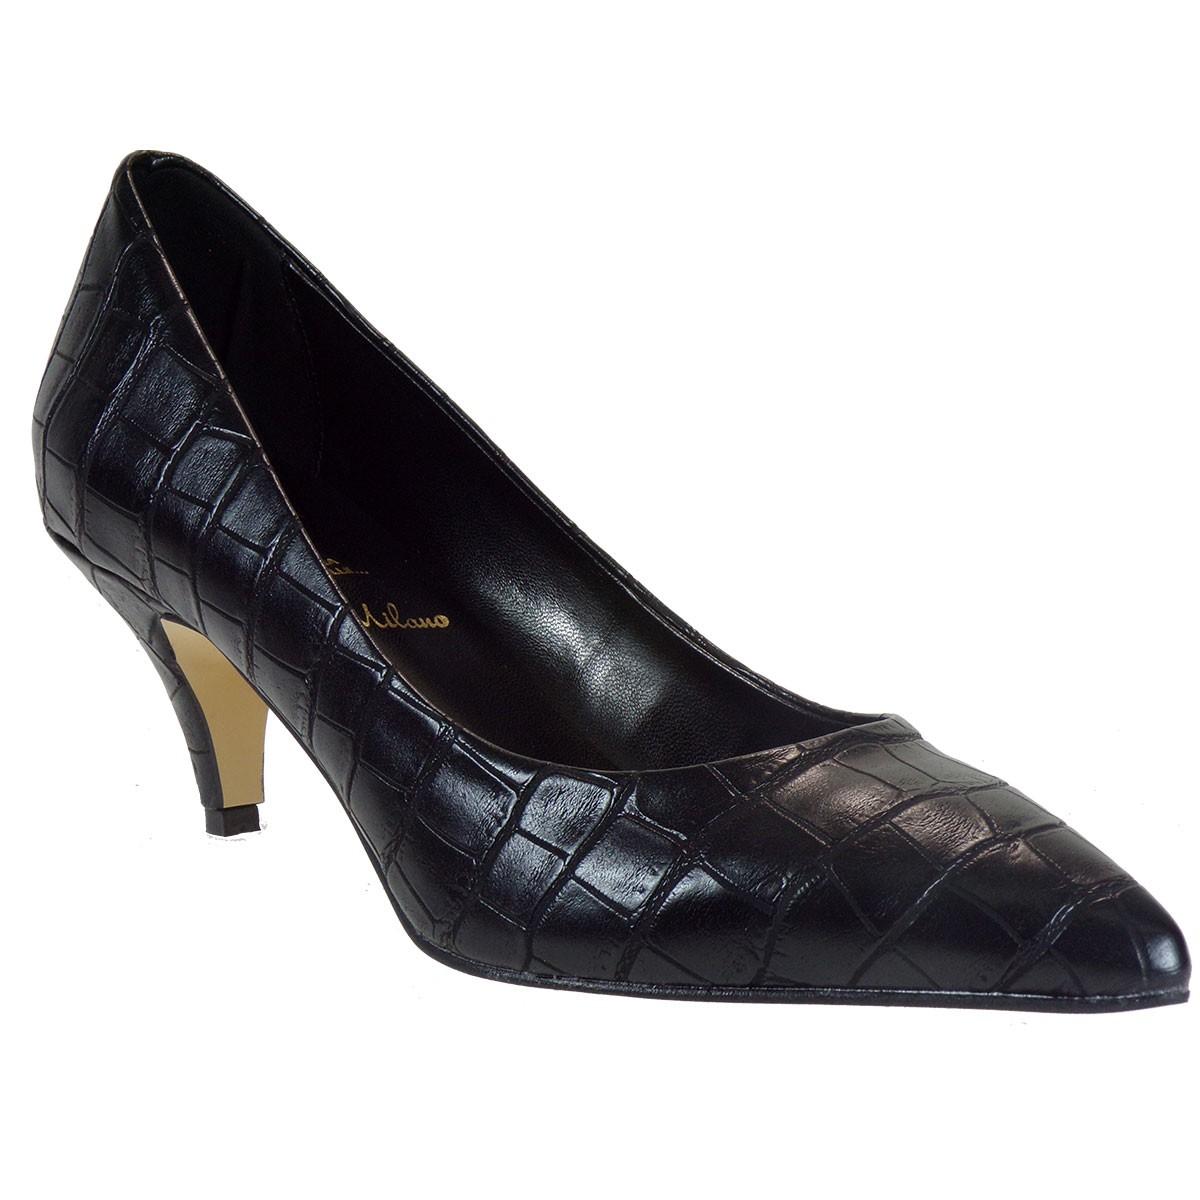 Alessandra Paggioti Γυναικεία Παπούτσια Γόβες 84001 Μαύρο Κροκό